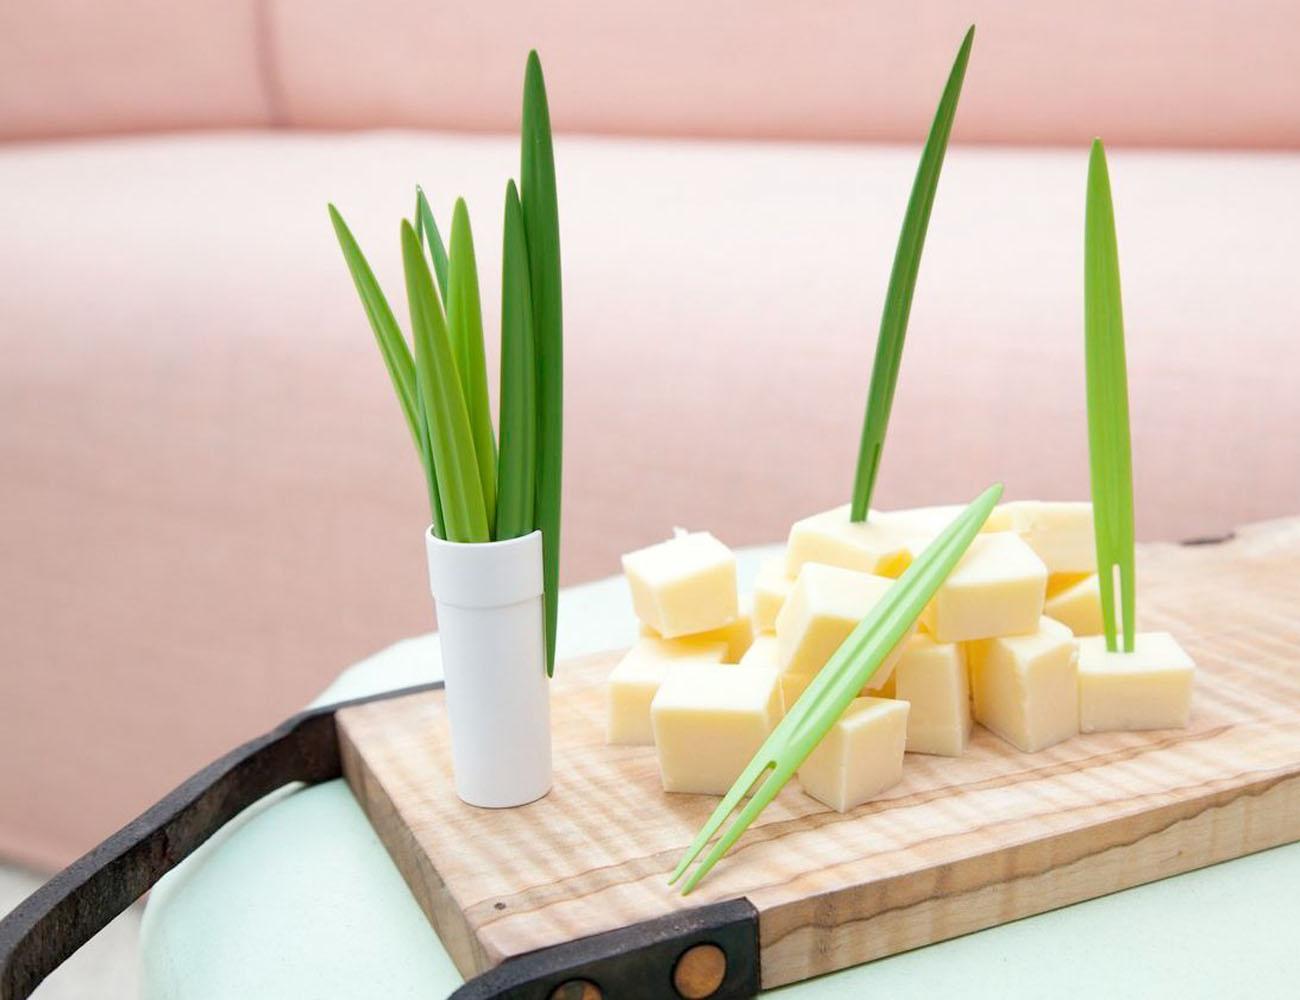 Leaf Picks – Blade of Grass Shaped Food Picking Tool